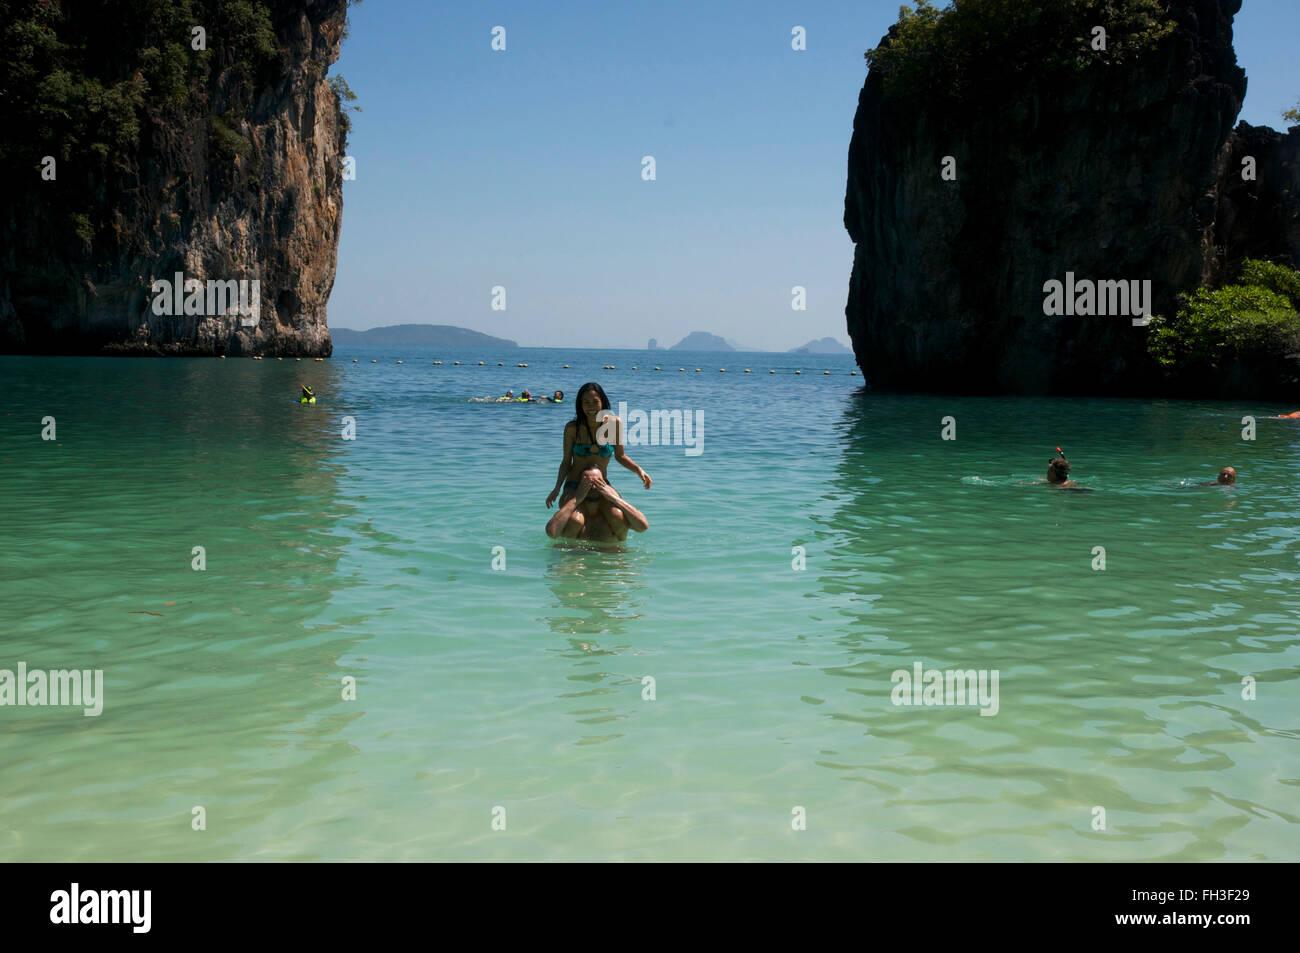 couple having fun in lagoon at Hong island. - Stock Image